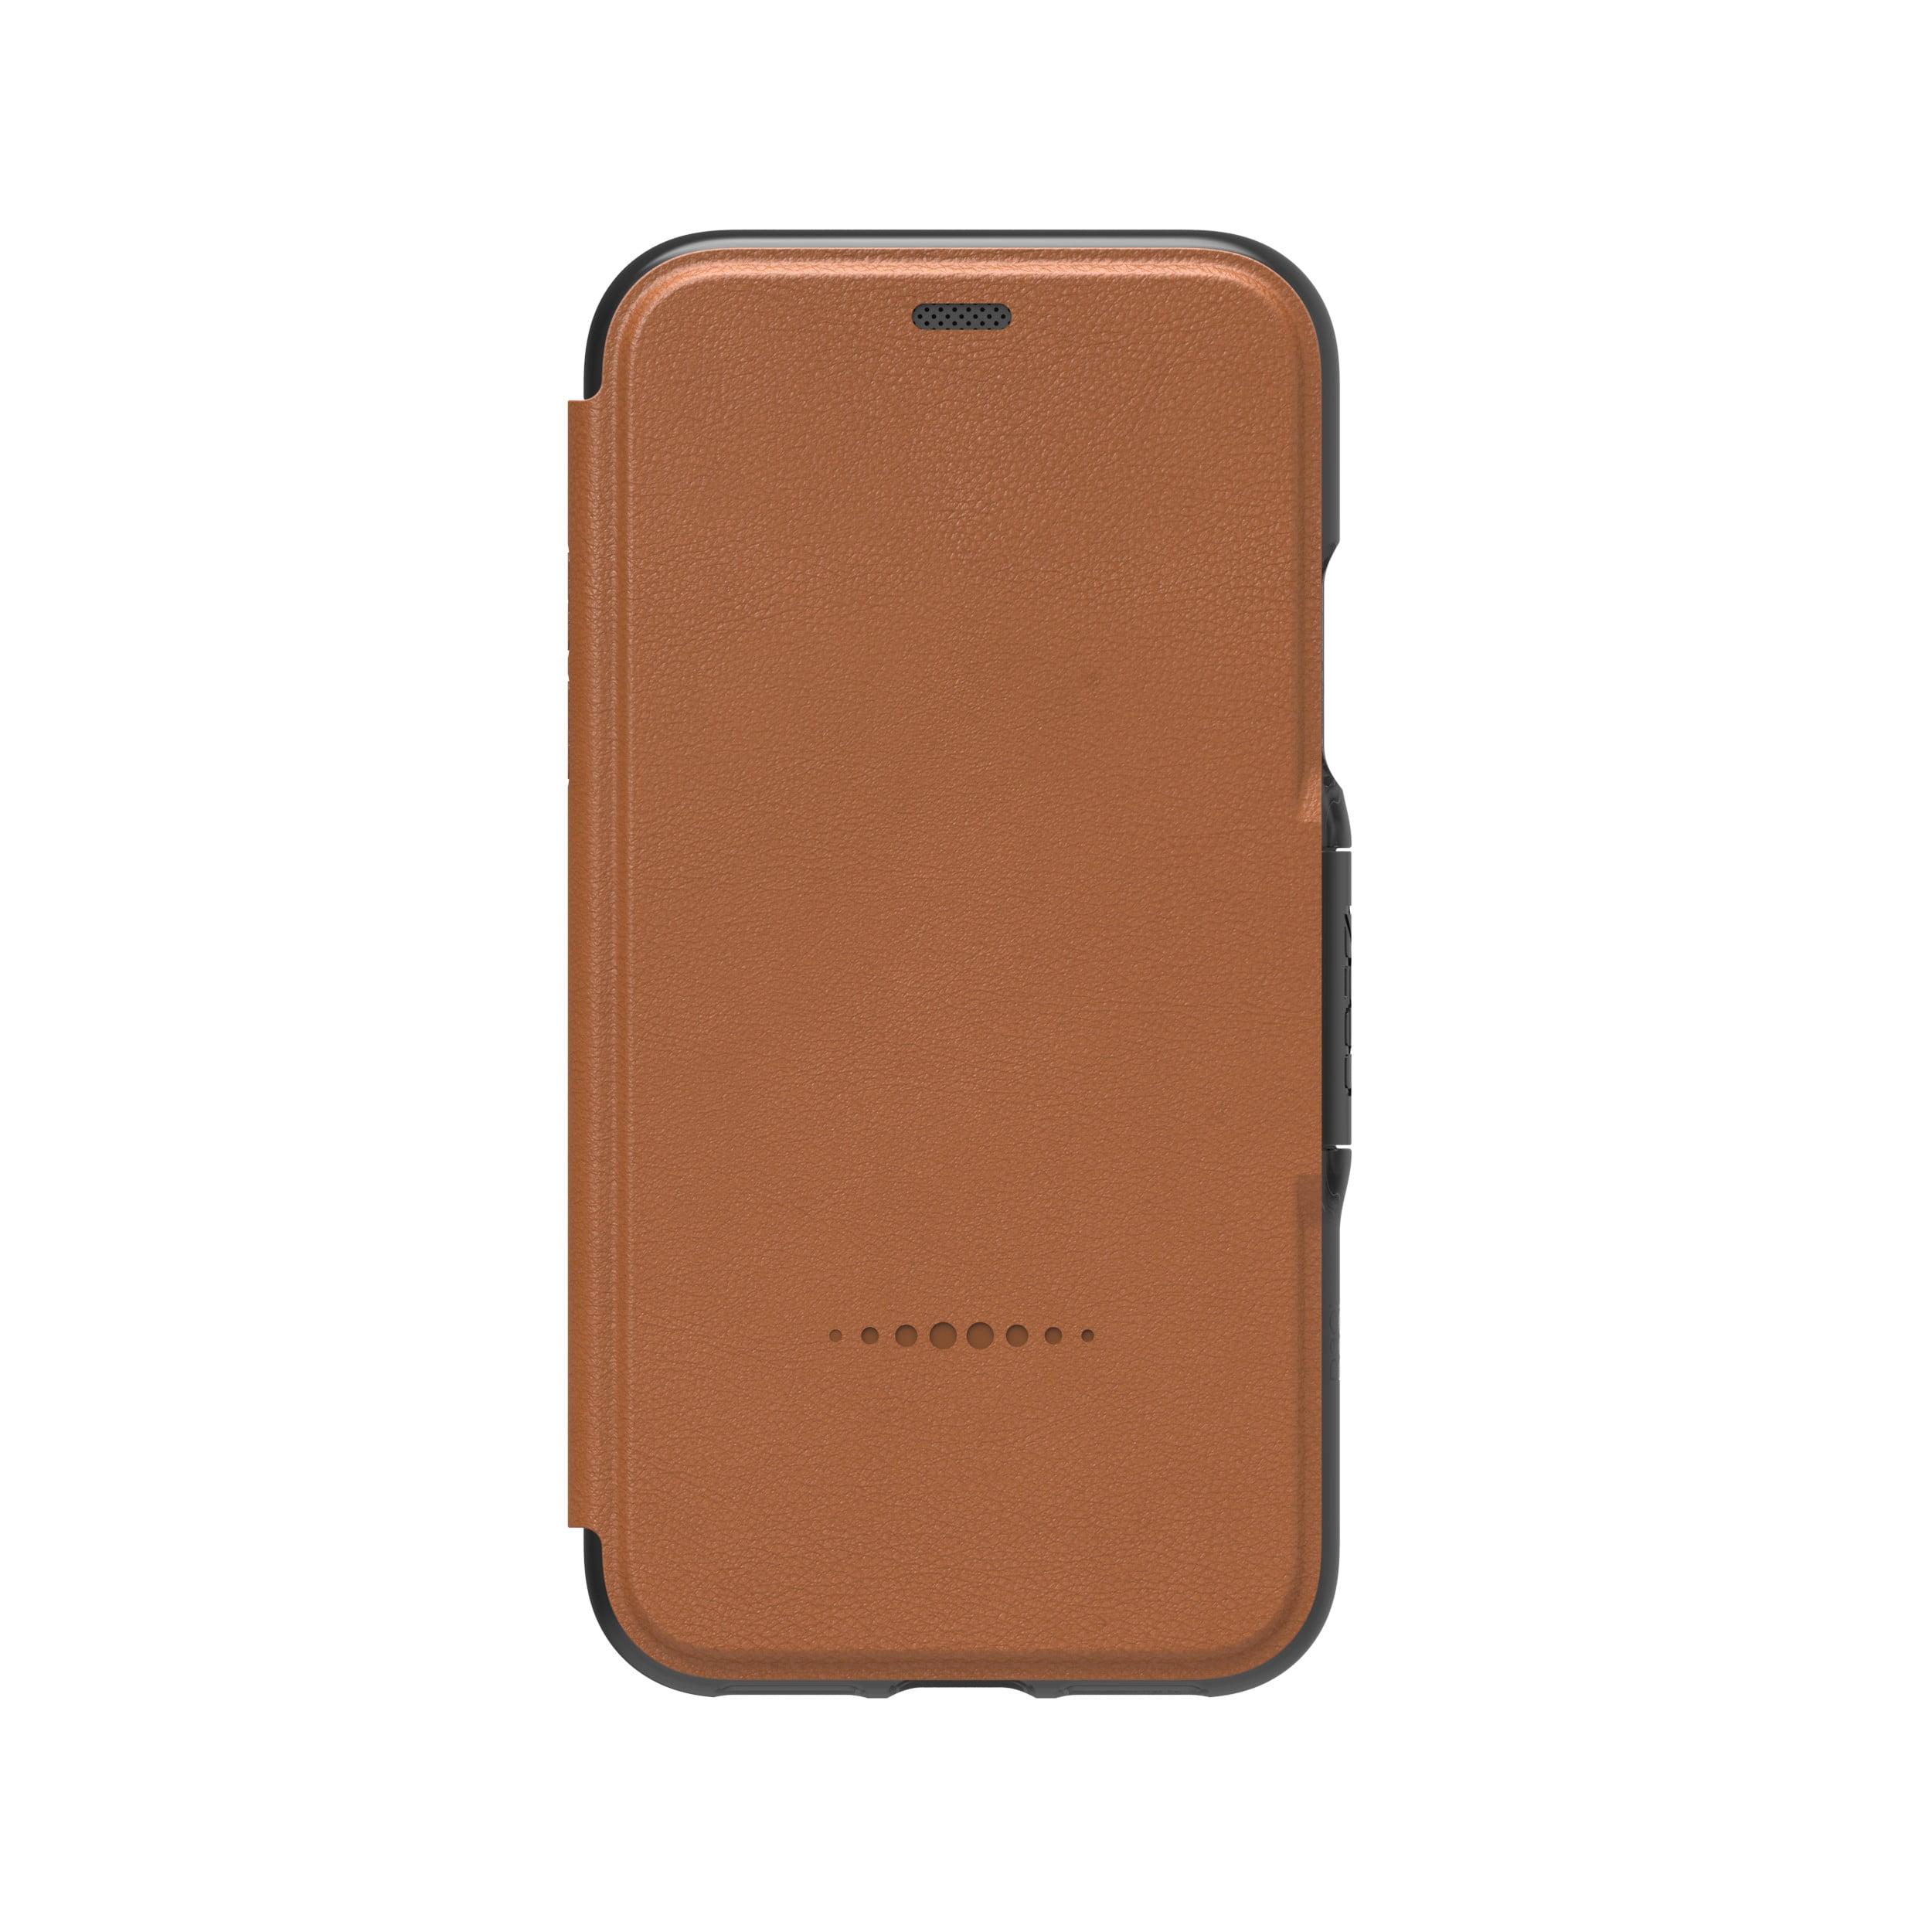 b4b1301556b5a GEAR4 iPhone X/Xs D3O light tan Oxford Leather BookCase - IC8OXLVBWN